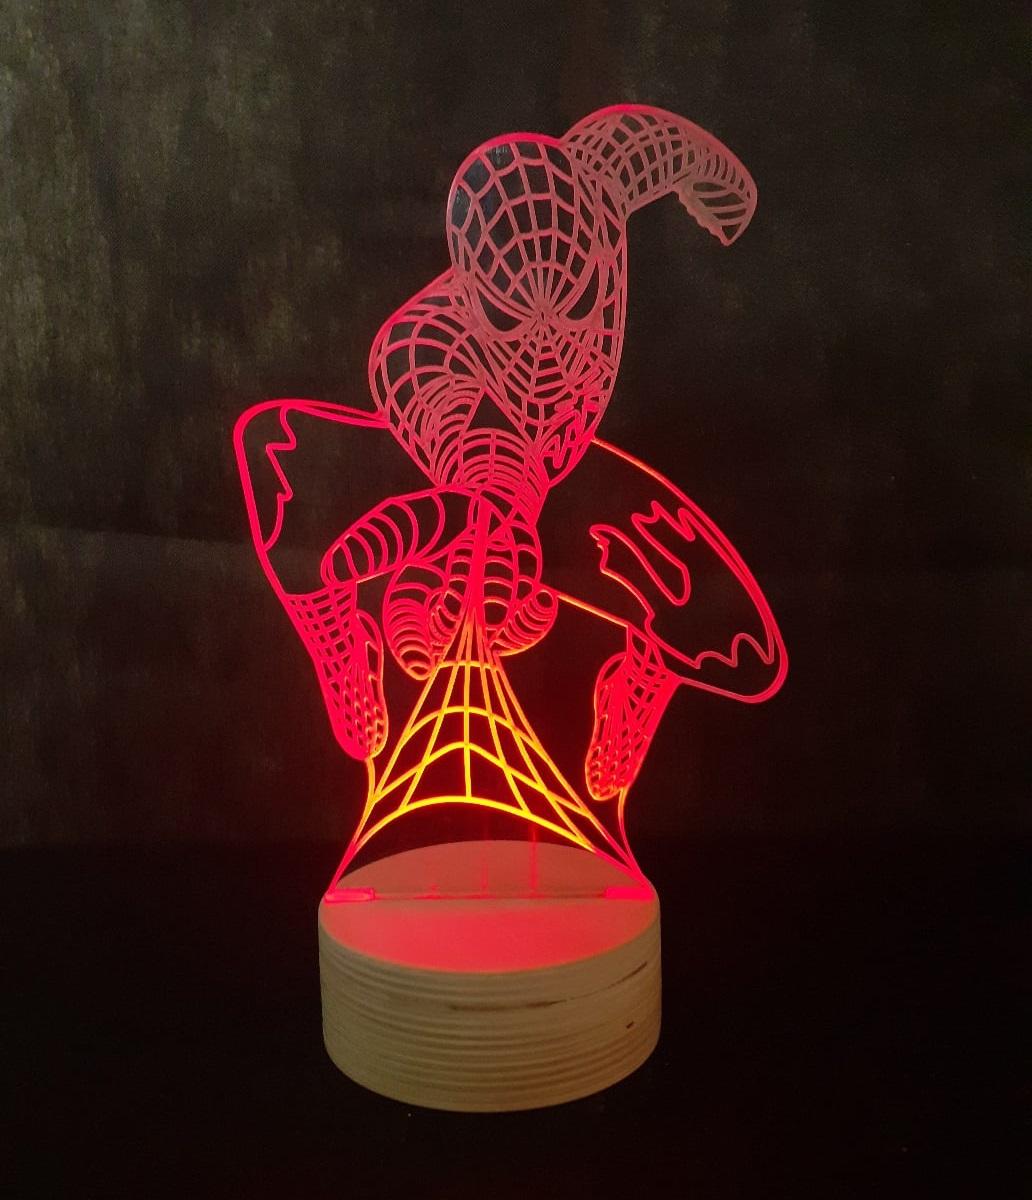 Laser Cut Spider Man LED Night Light 3D Lamp Free Vector